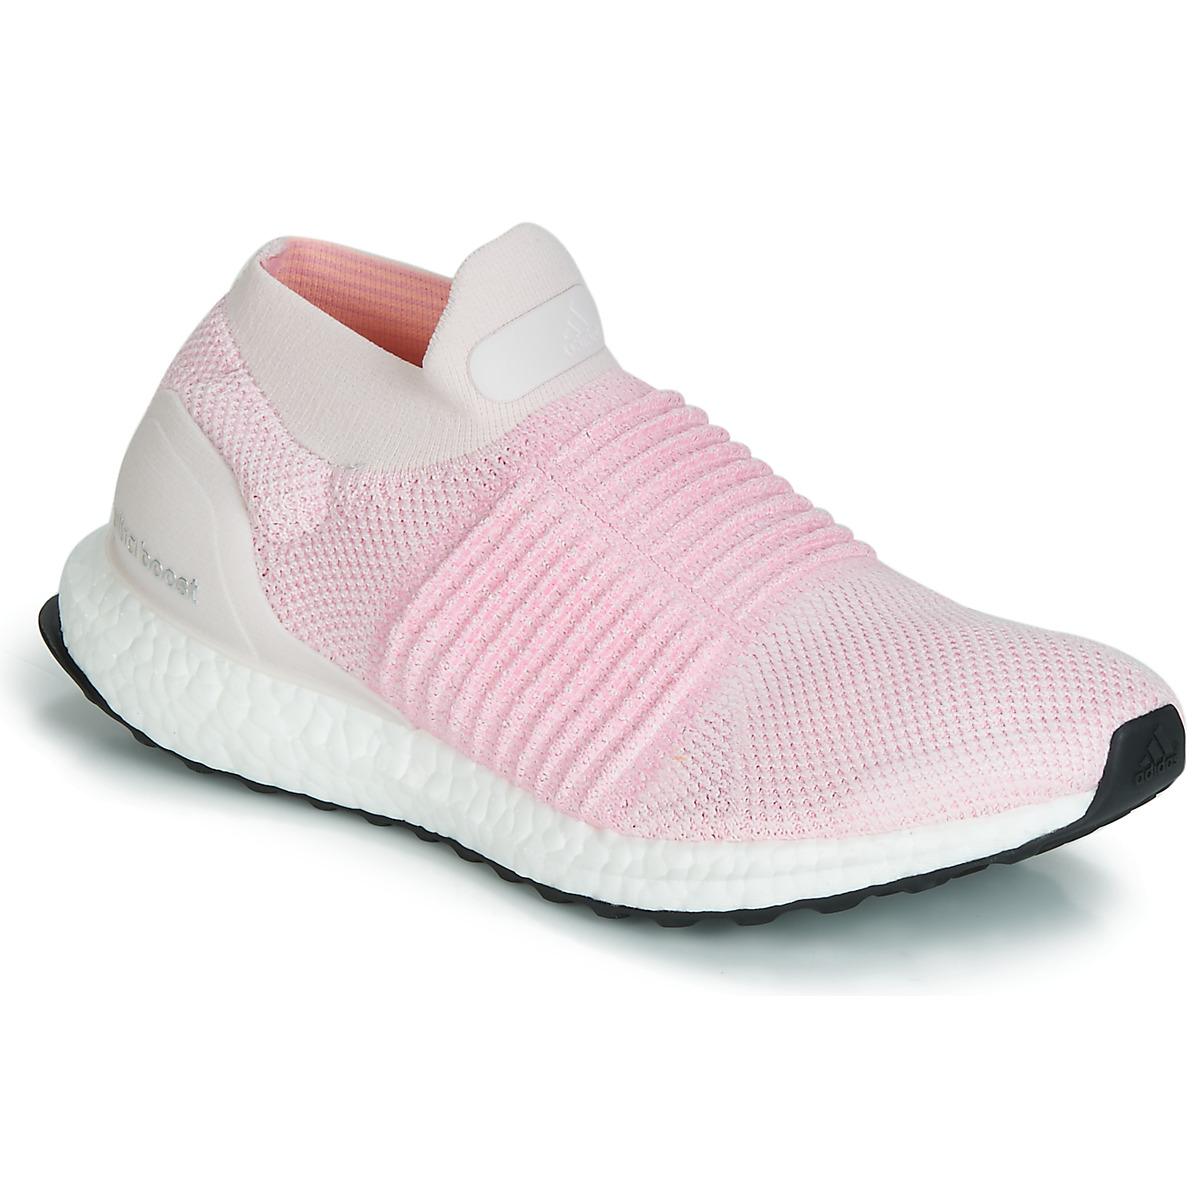 scarpe adidas ultraboost donna